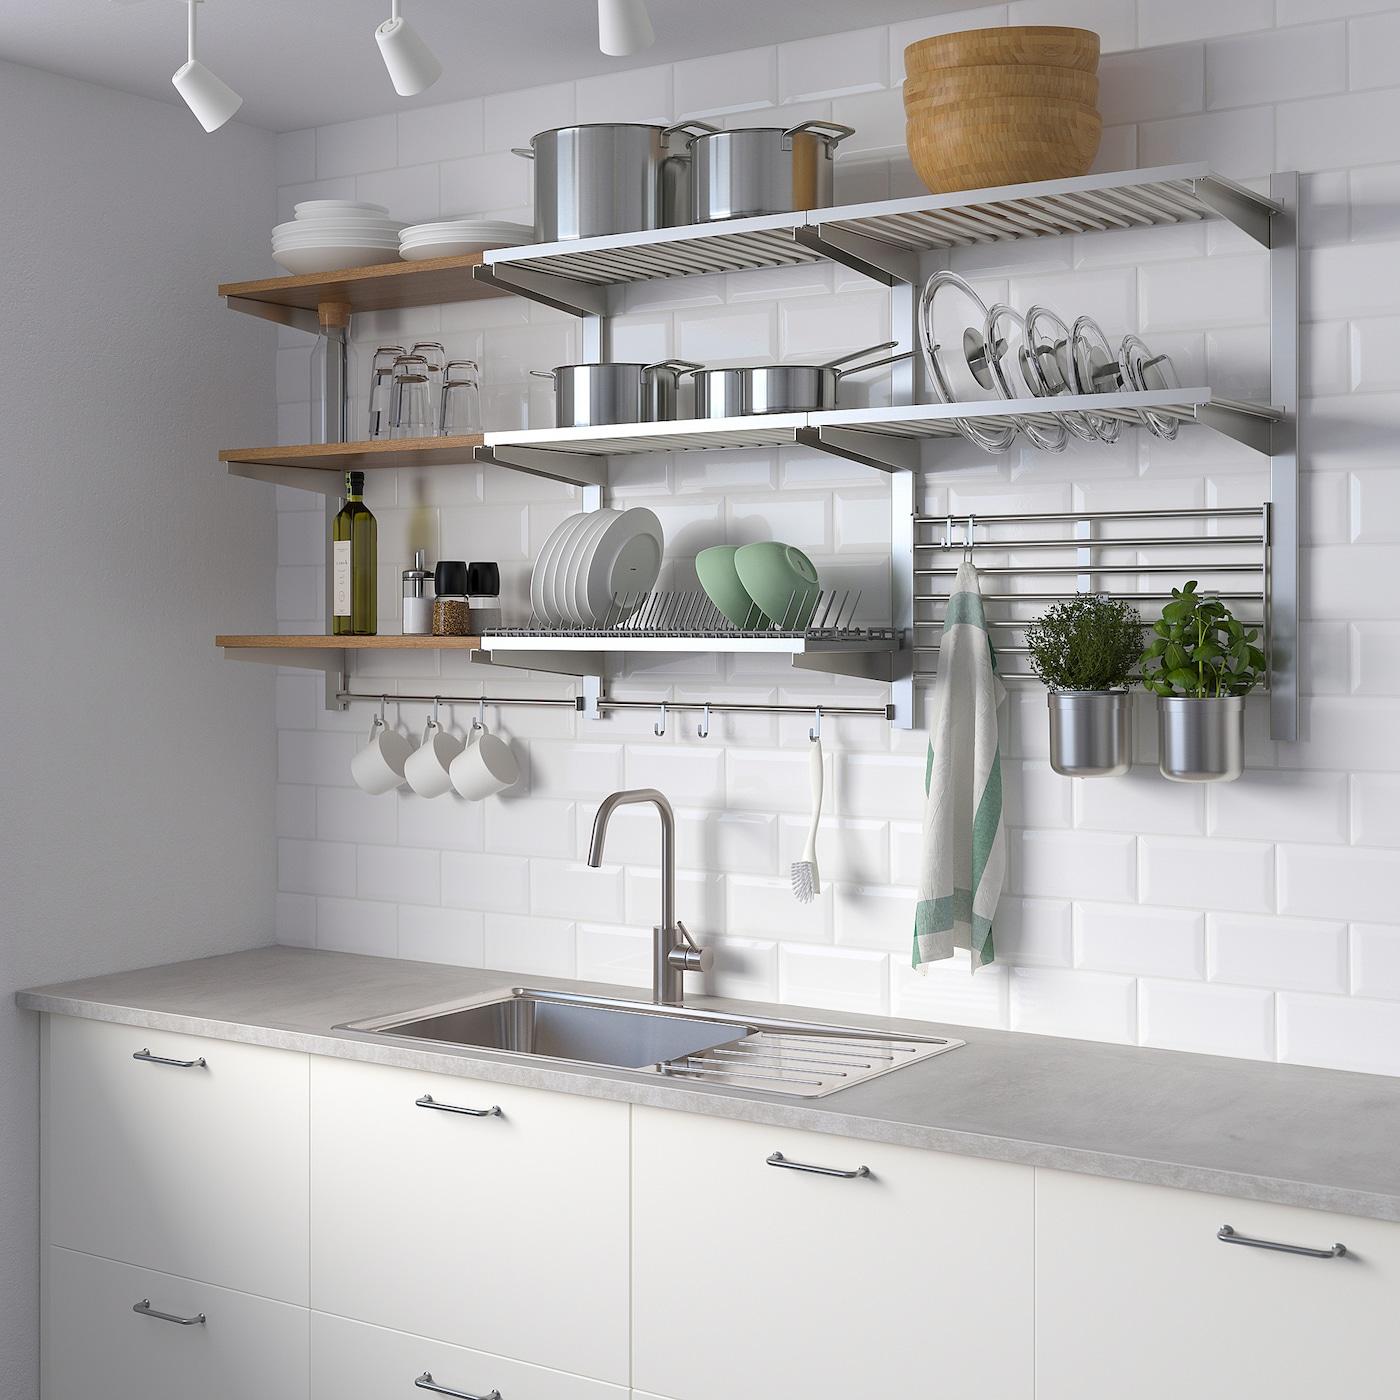 Ekbacken Countertop Light Gray Concrete Effect Laminate Ikea Canada Ikea